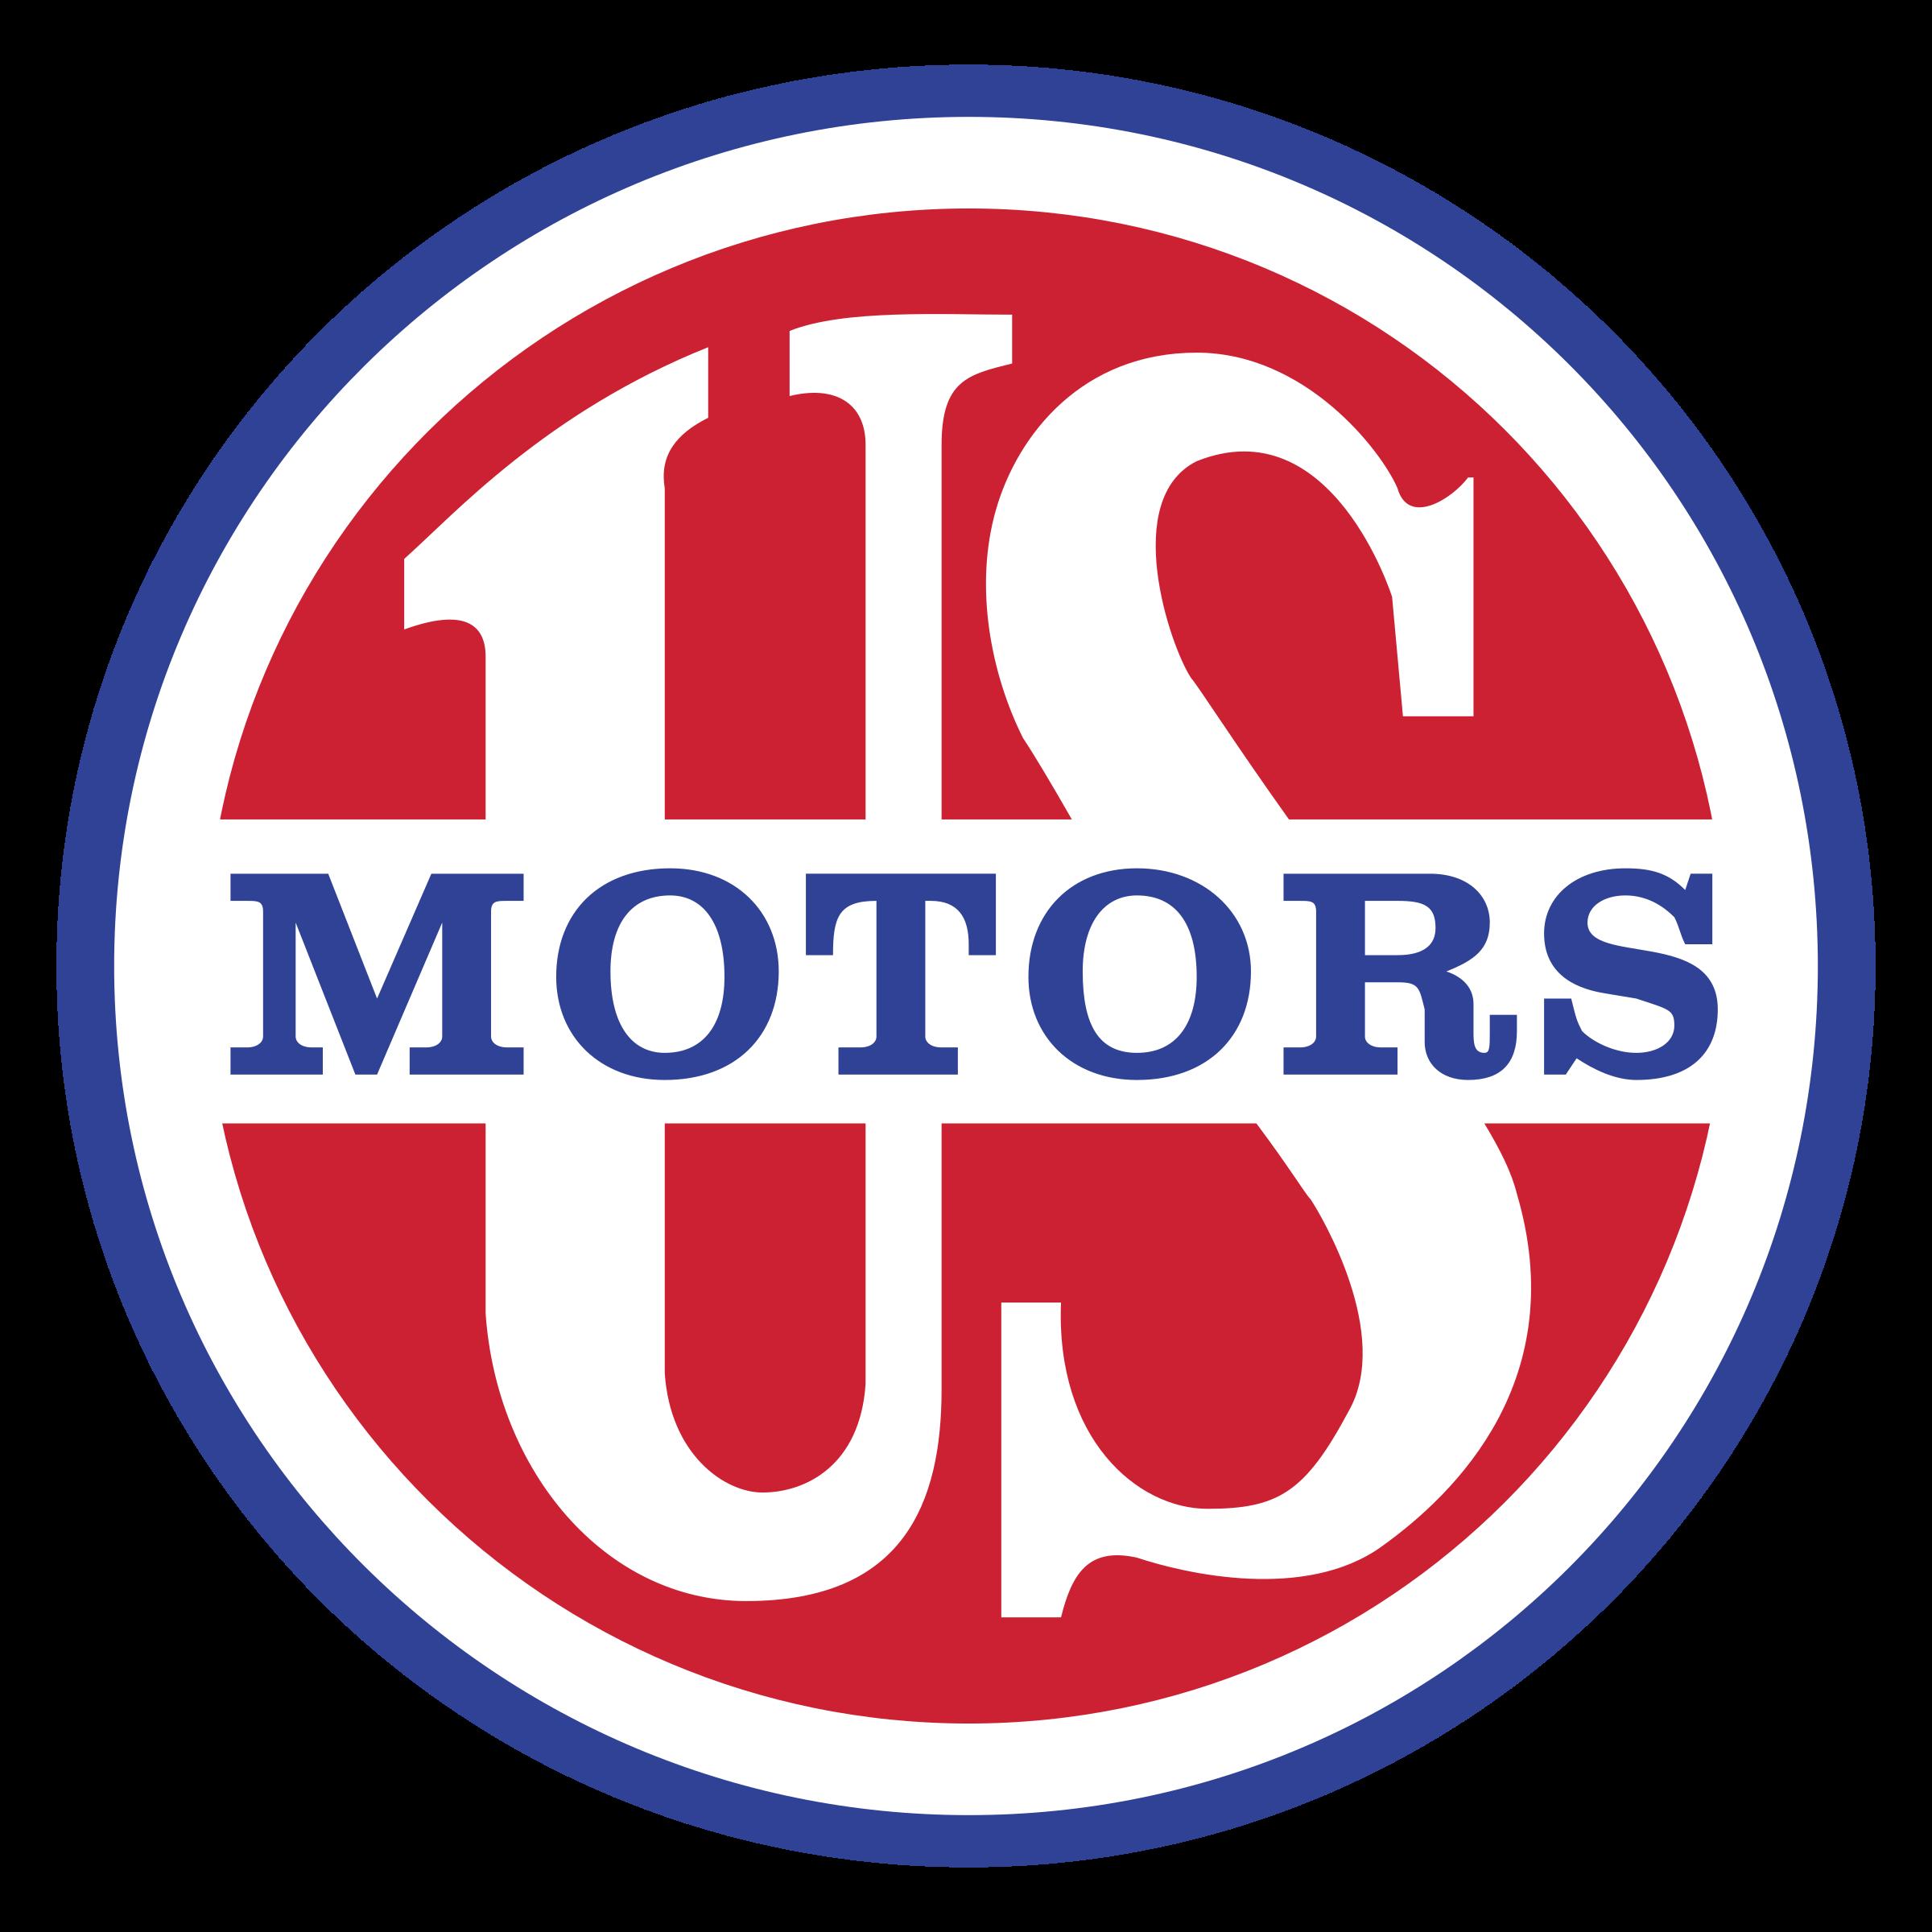 U S Electrical Motors Logo PNG Transparent & SVG Vector - Freebie Supply